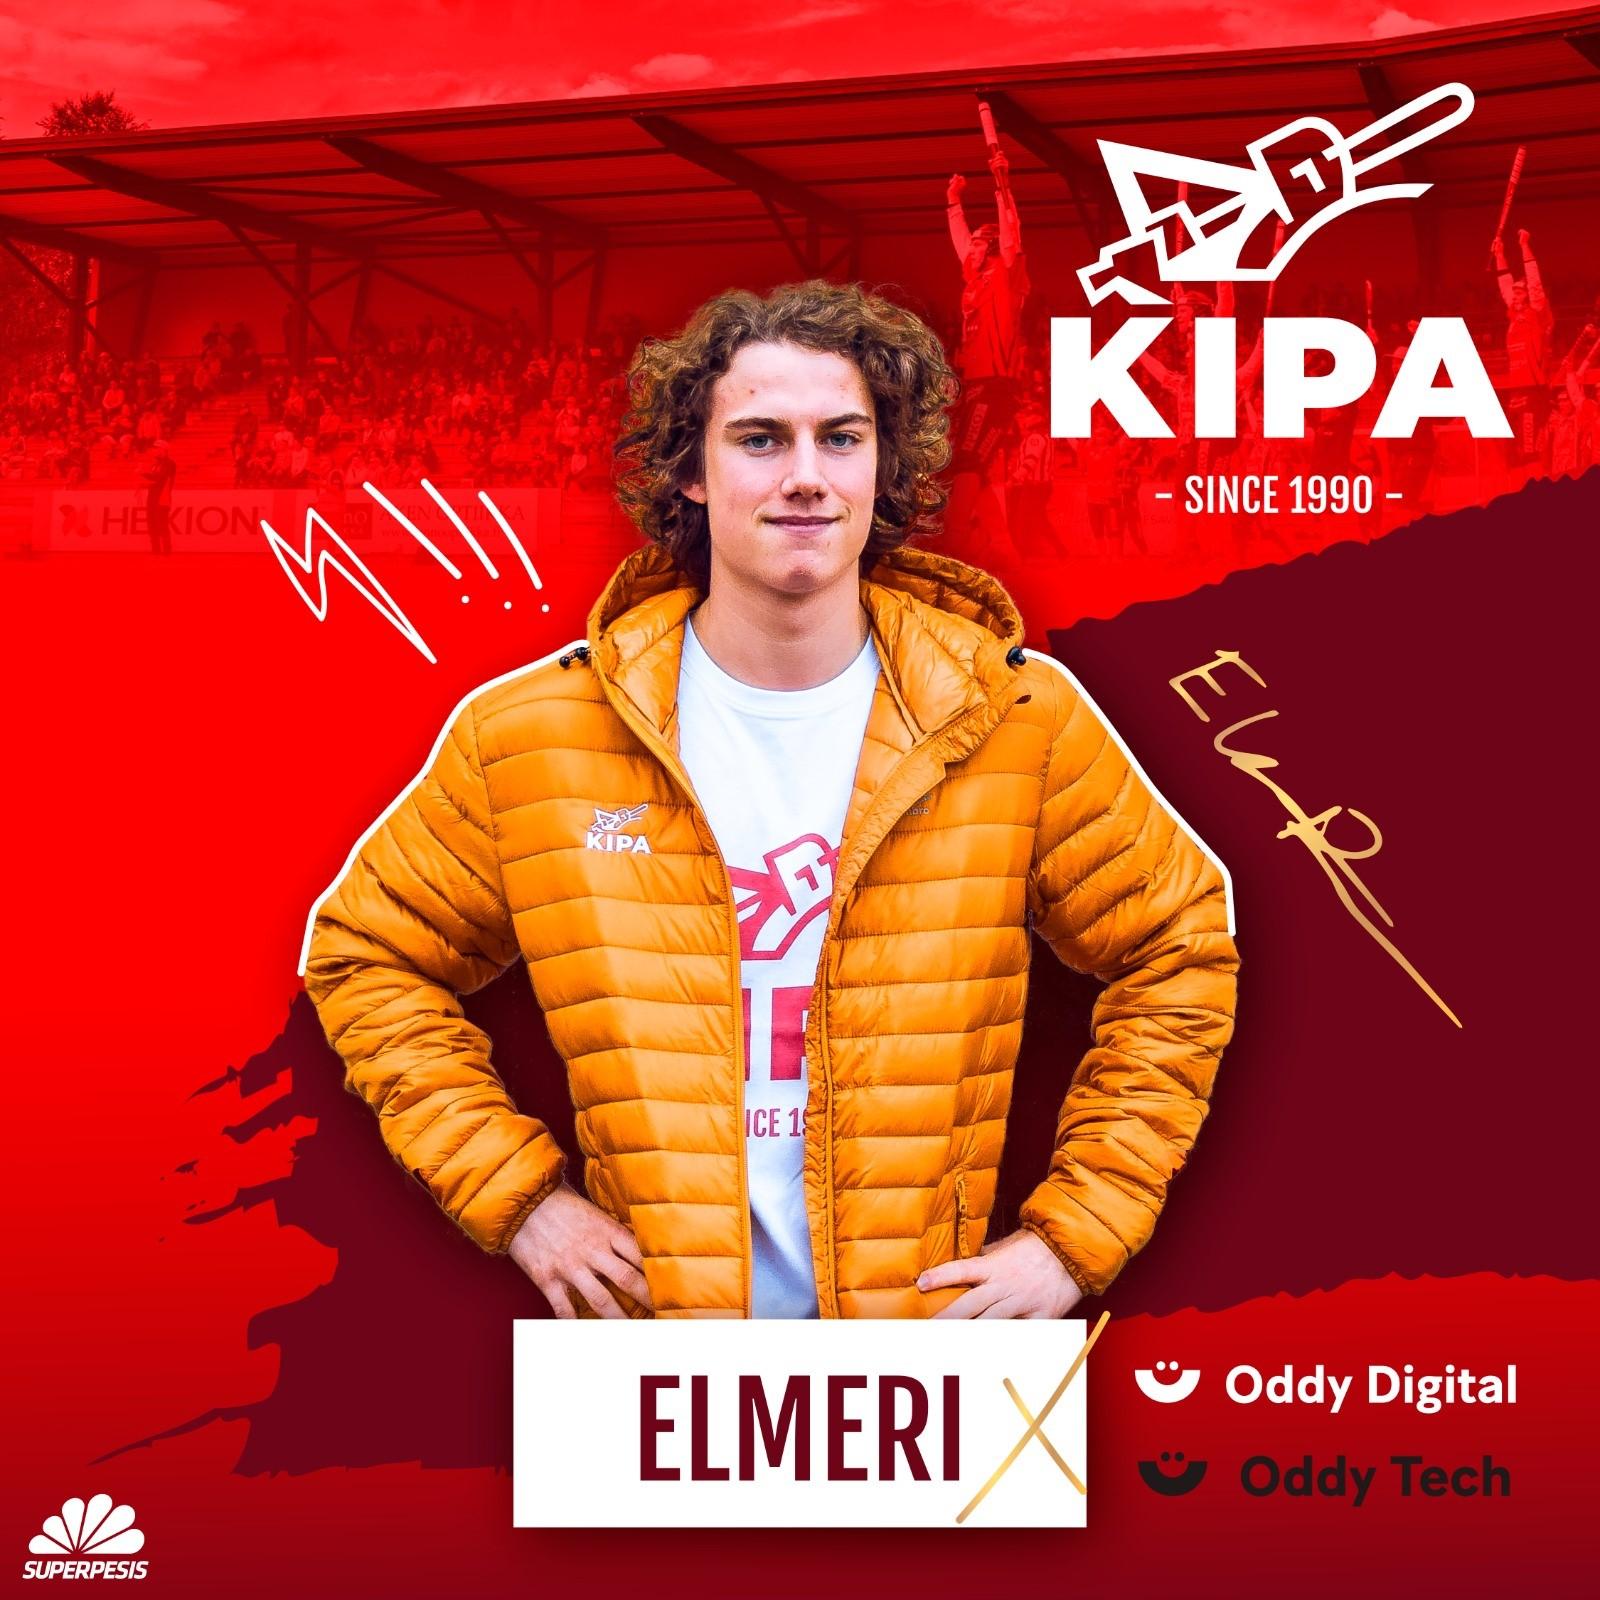 kipa90.com